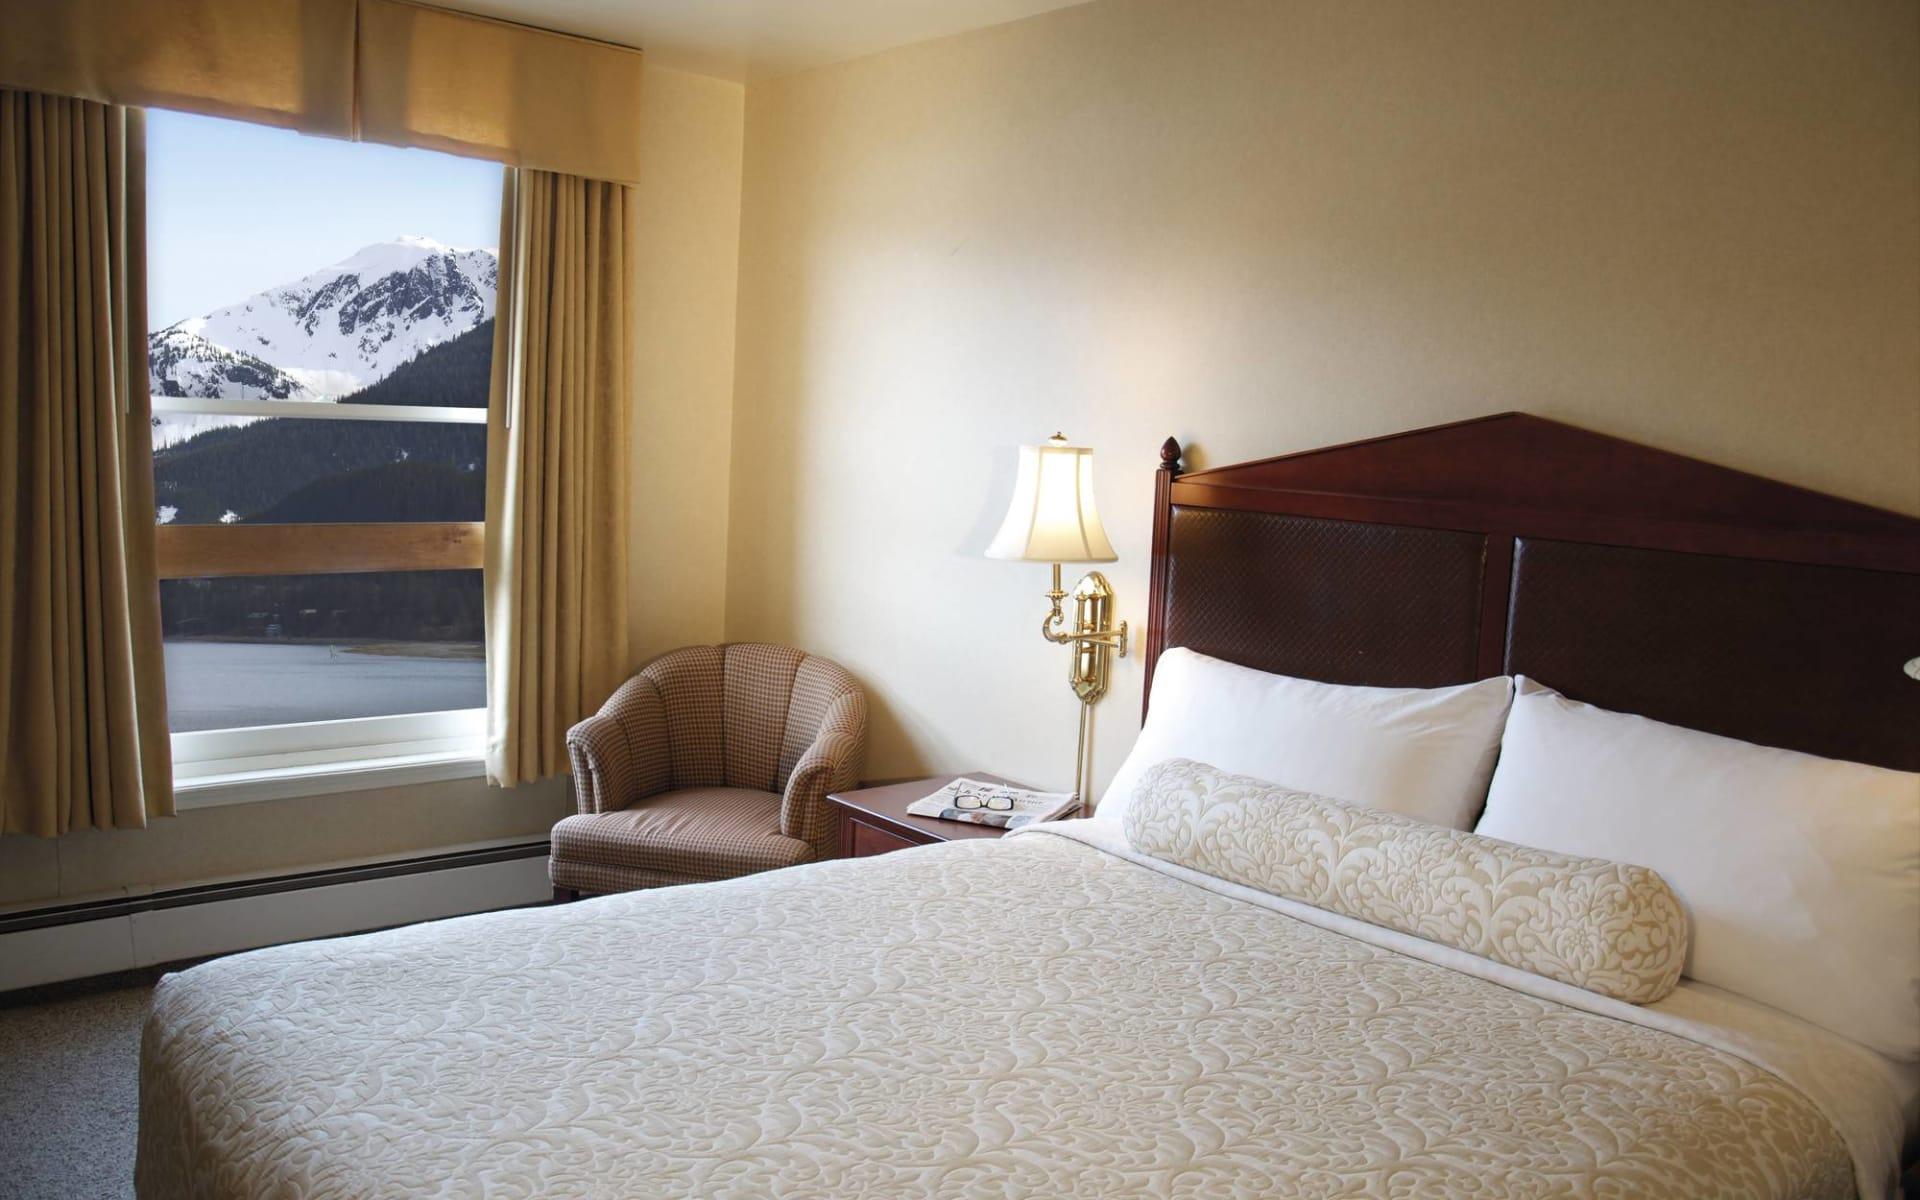 Baranof Hotel, BW Signature Collection in Juneau:  Westmark Baranof - Standard Room c Jonview